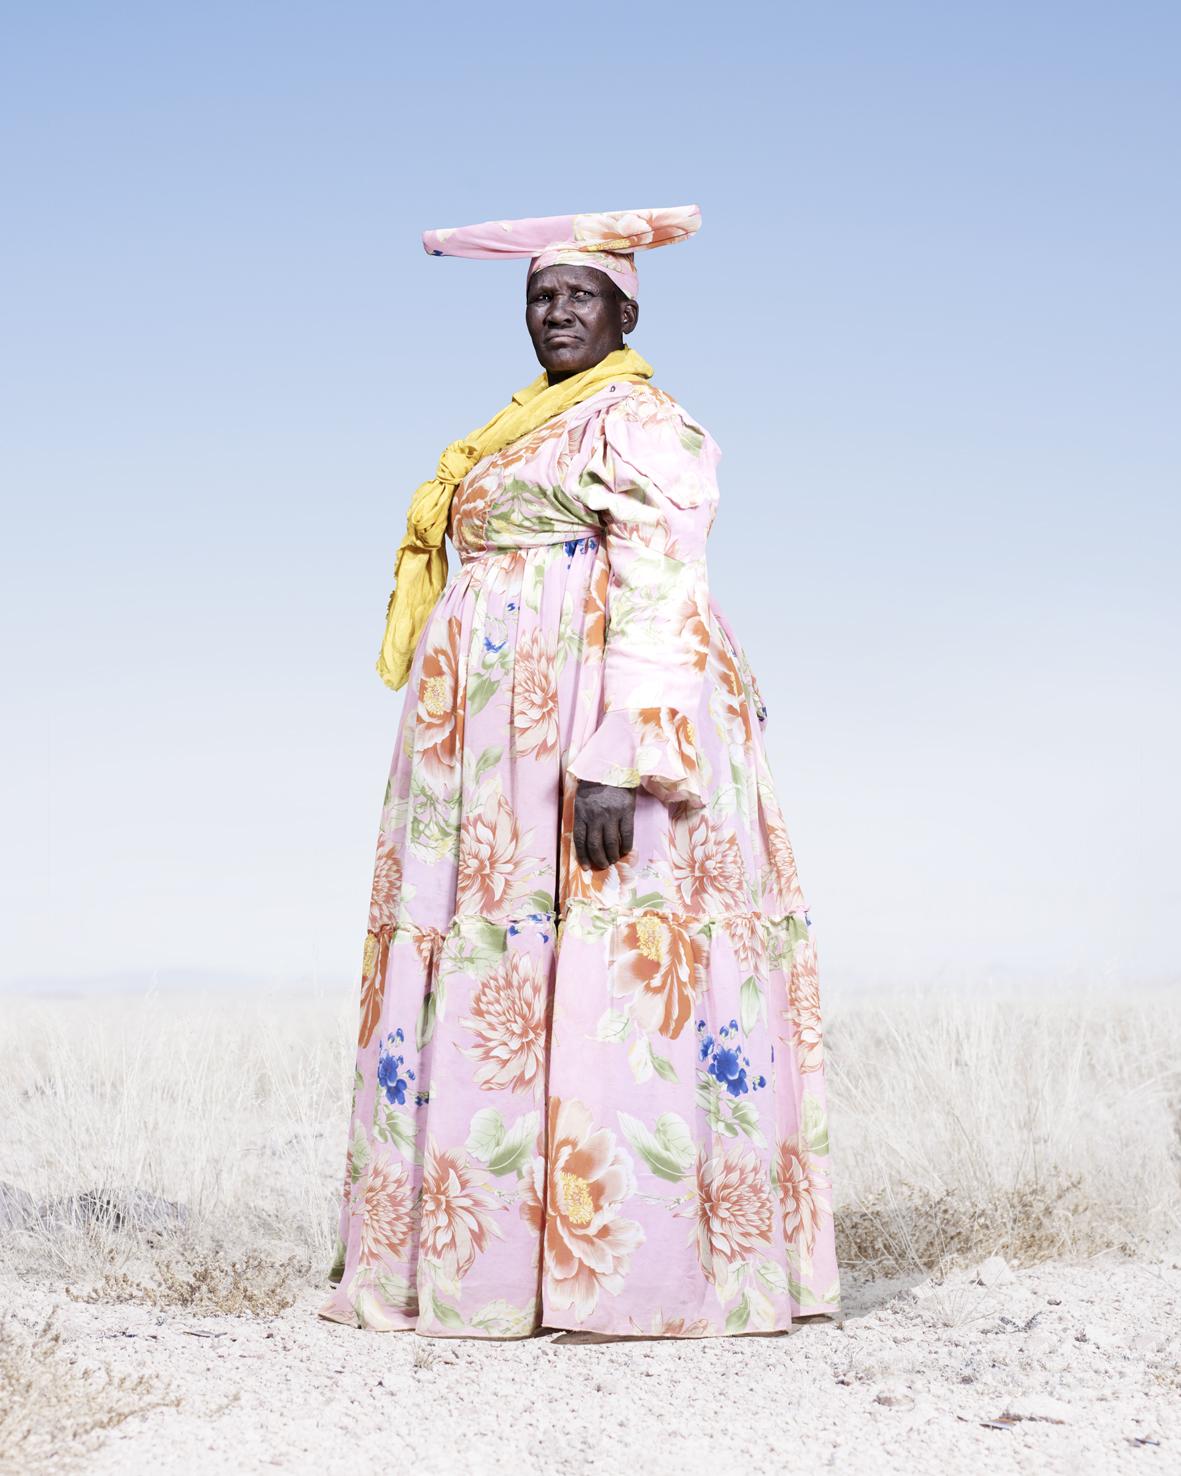 Herero women wears a yellow scarf and traditional headdress.